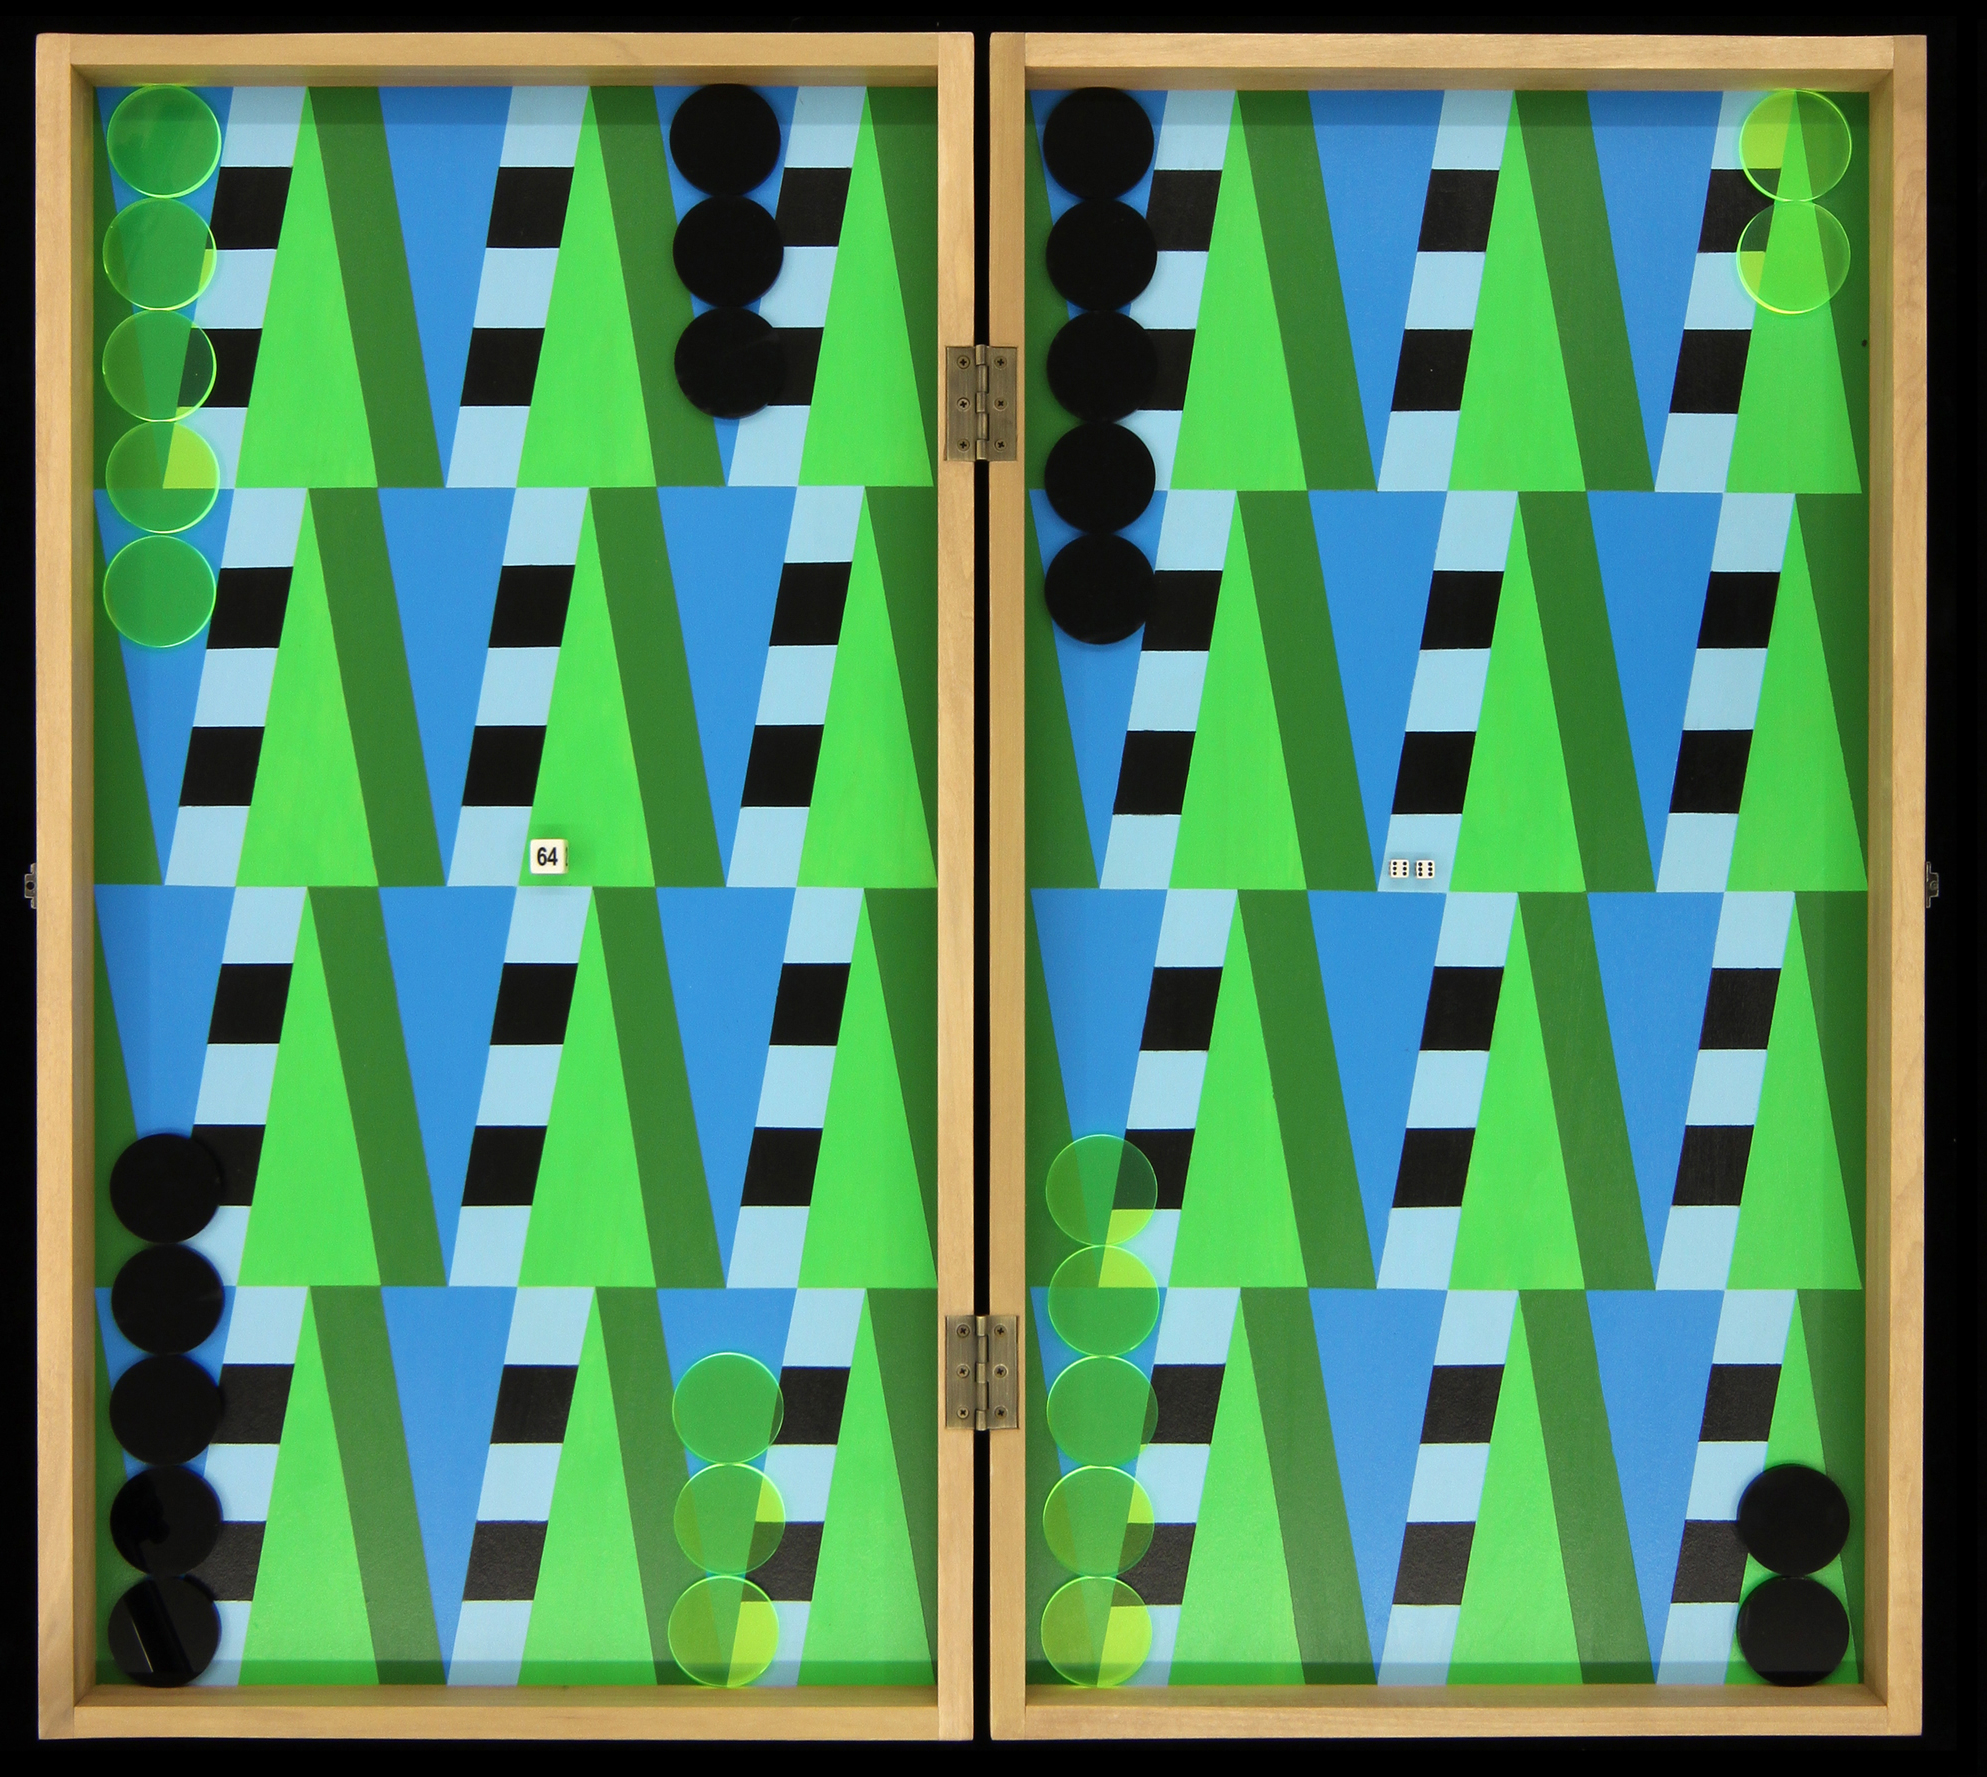 backgammon1a.jpg